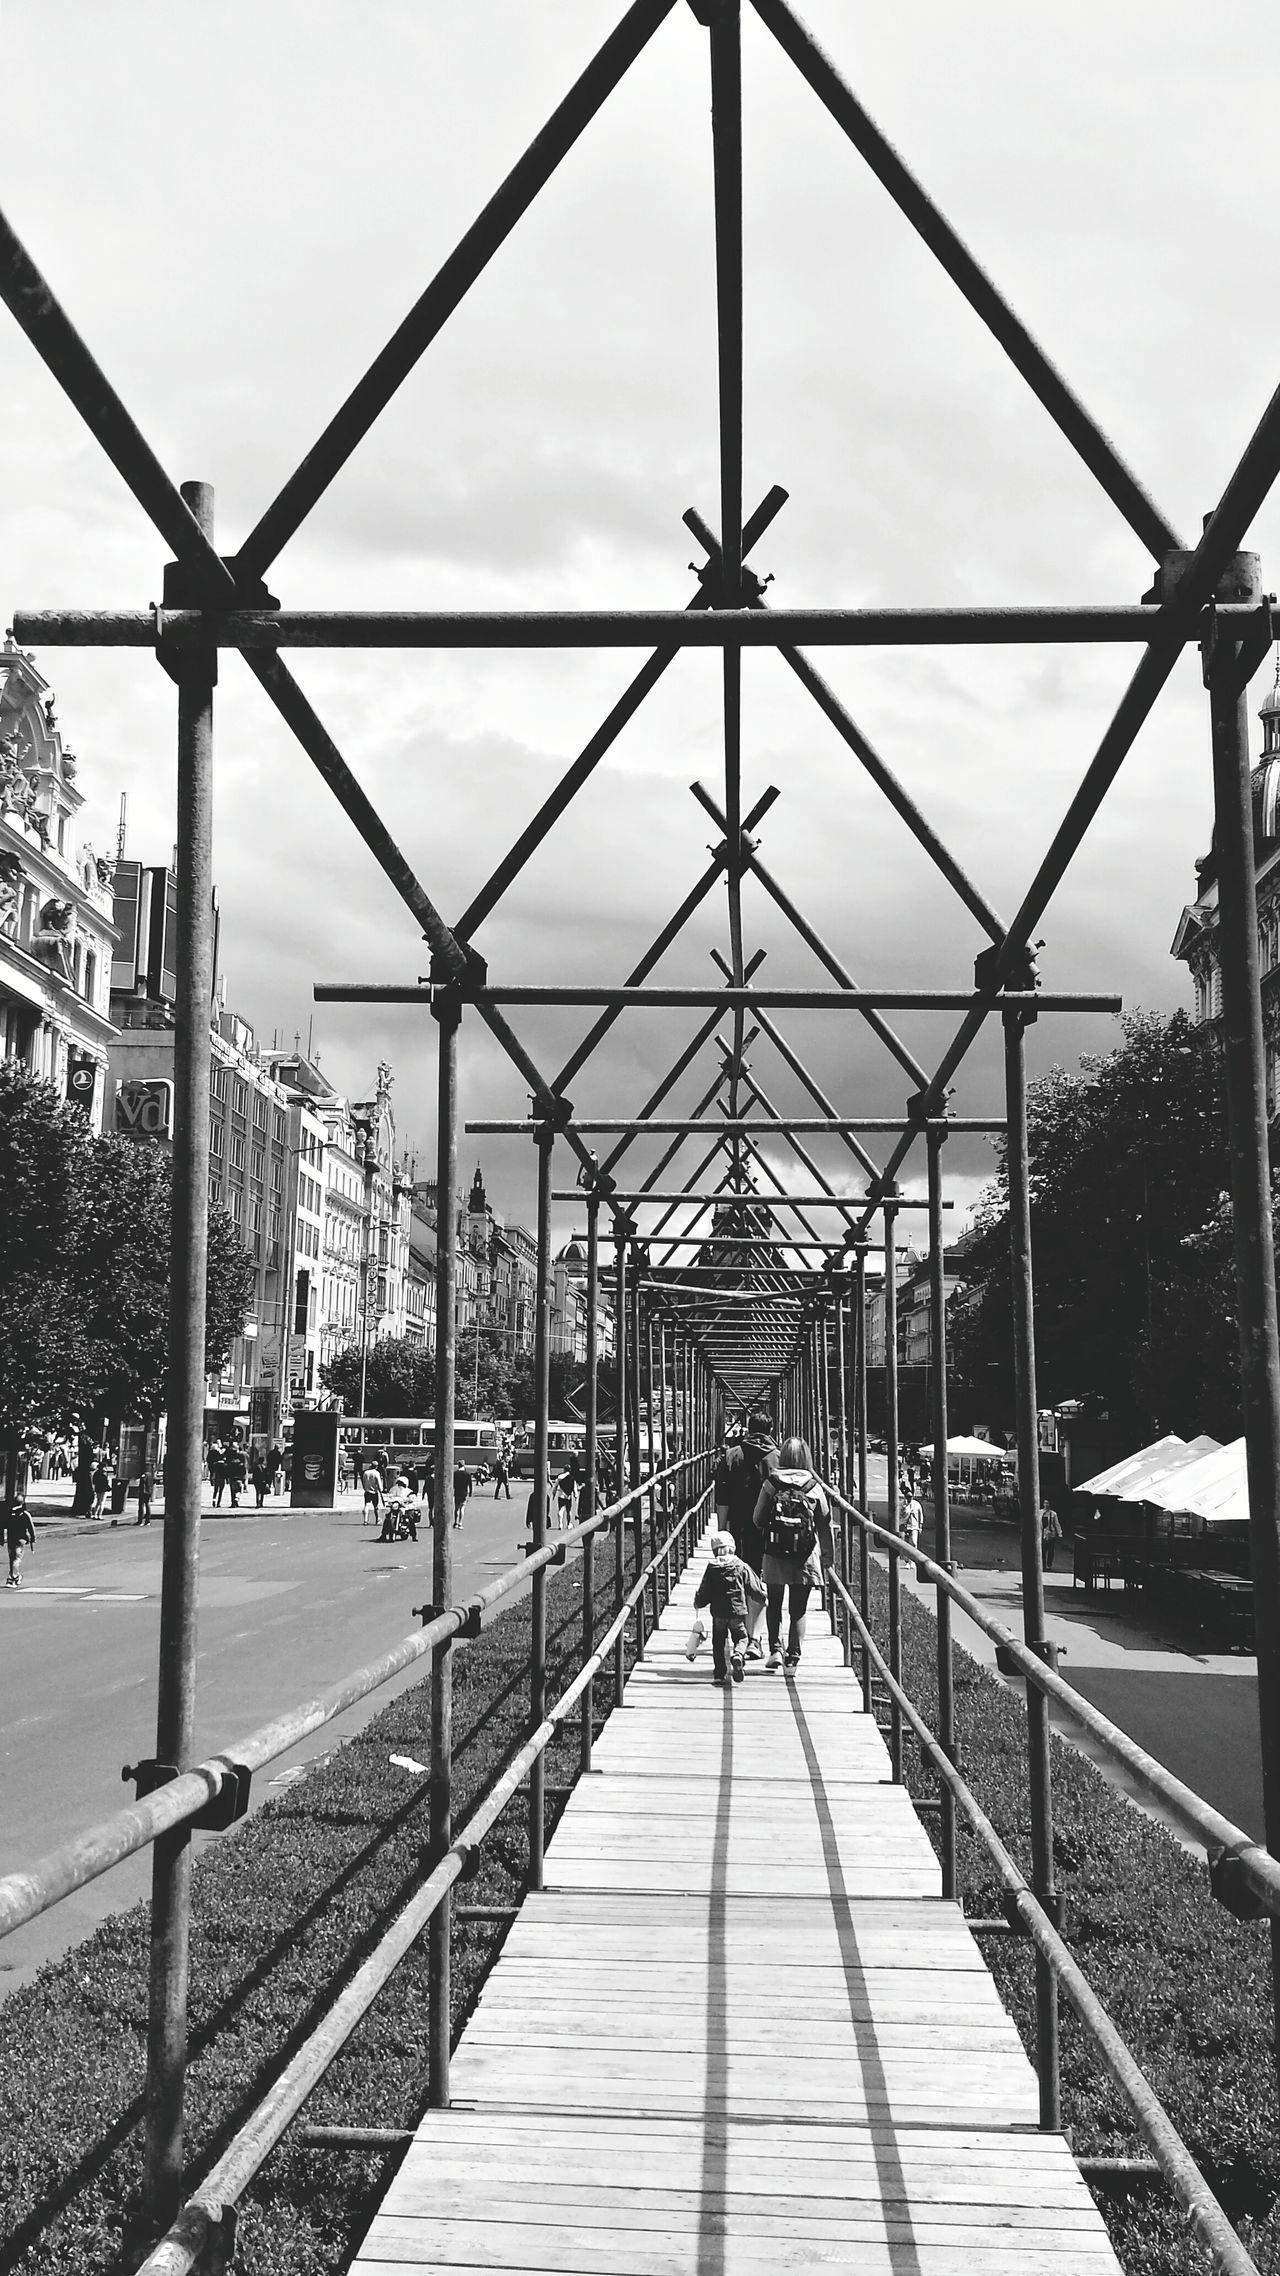 Black & White Wenzelsplatz Prague Praga I Love Prague The Architect - 2015 EyeEm Awards Impressive LocationsStreet Photography Interesting Perspectives The Great Outdoors - 2015 EyeEm Awards